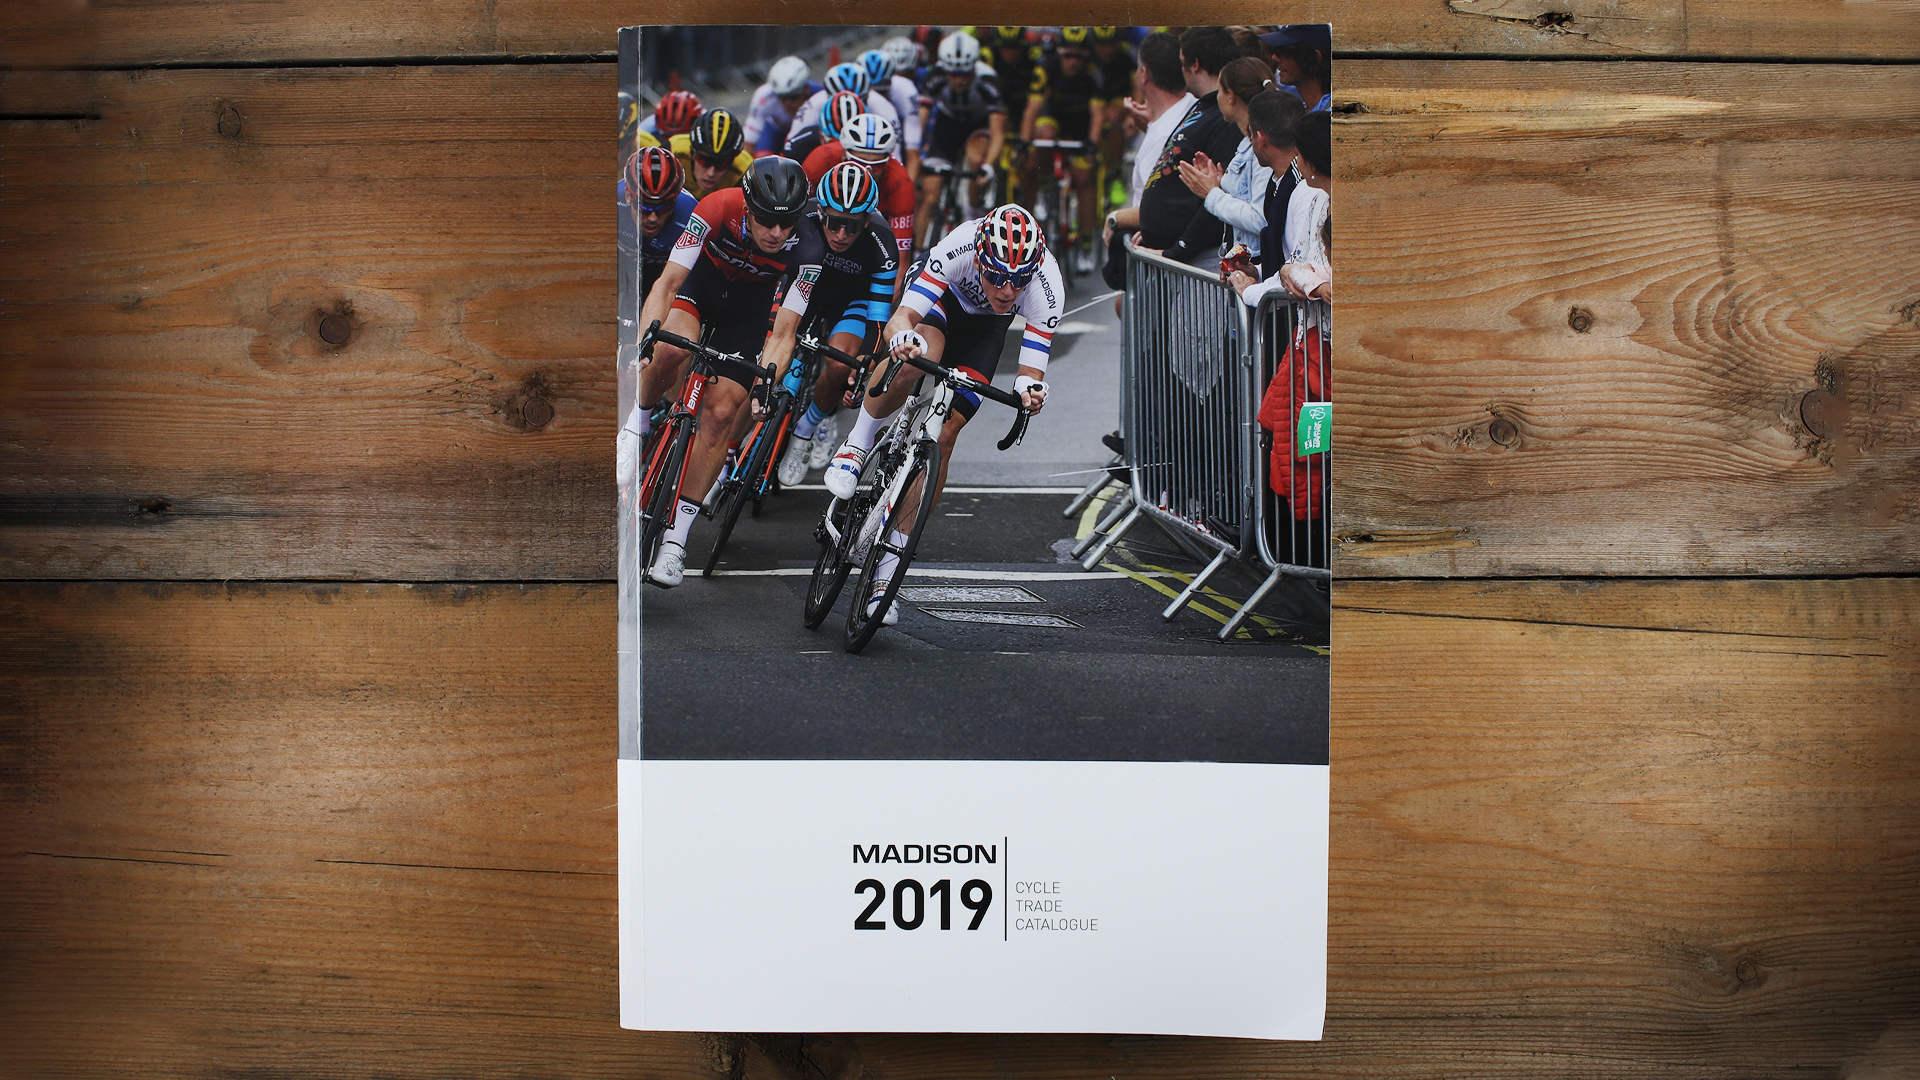 Madison-Cycle-Trade-Catalogues